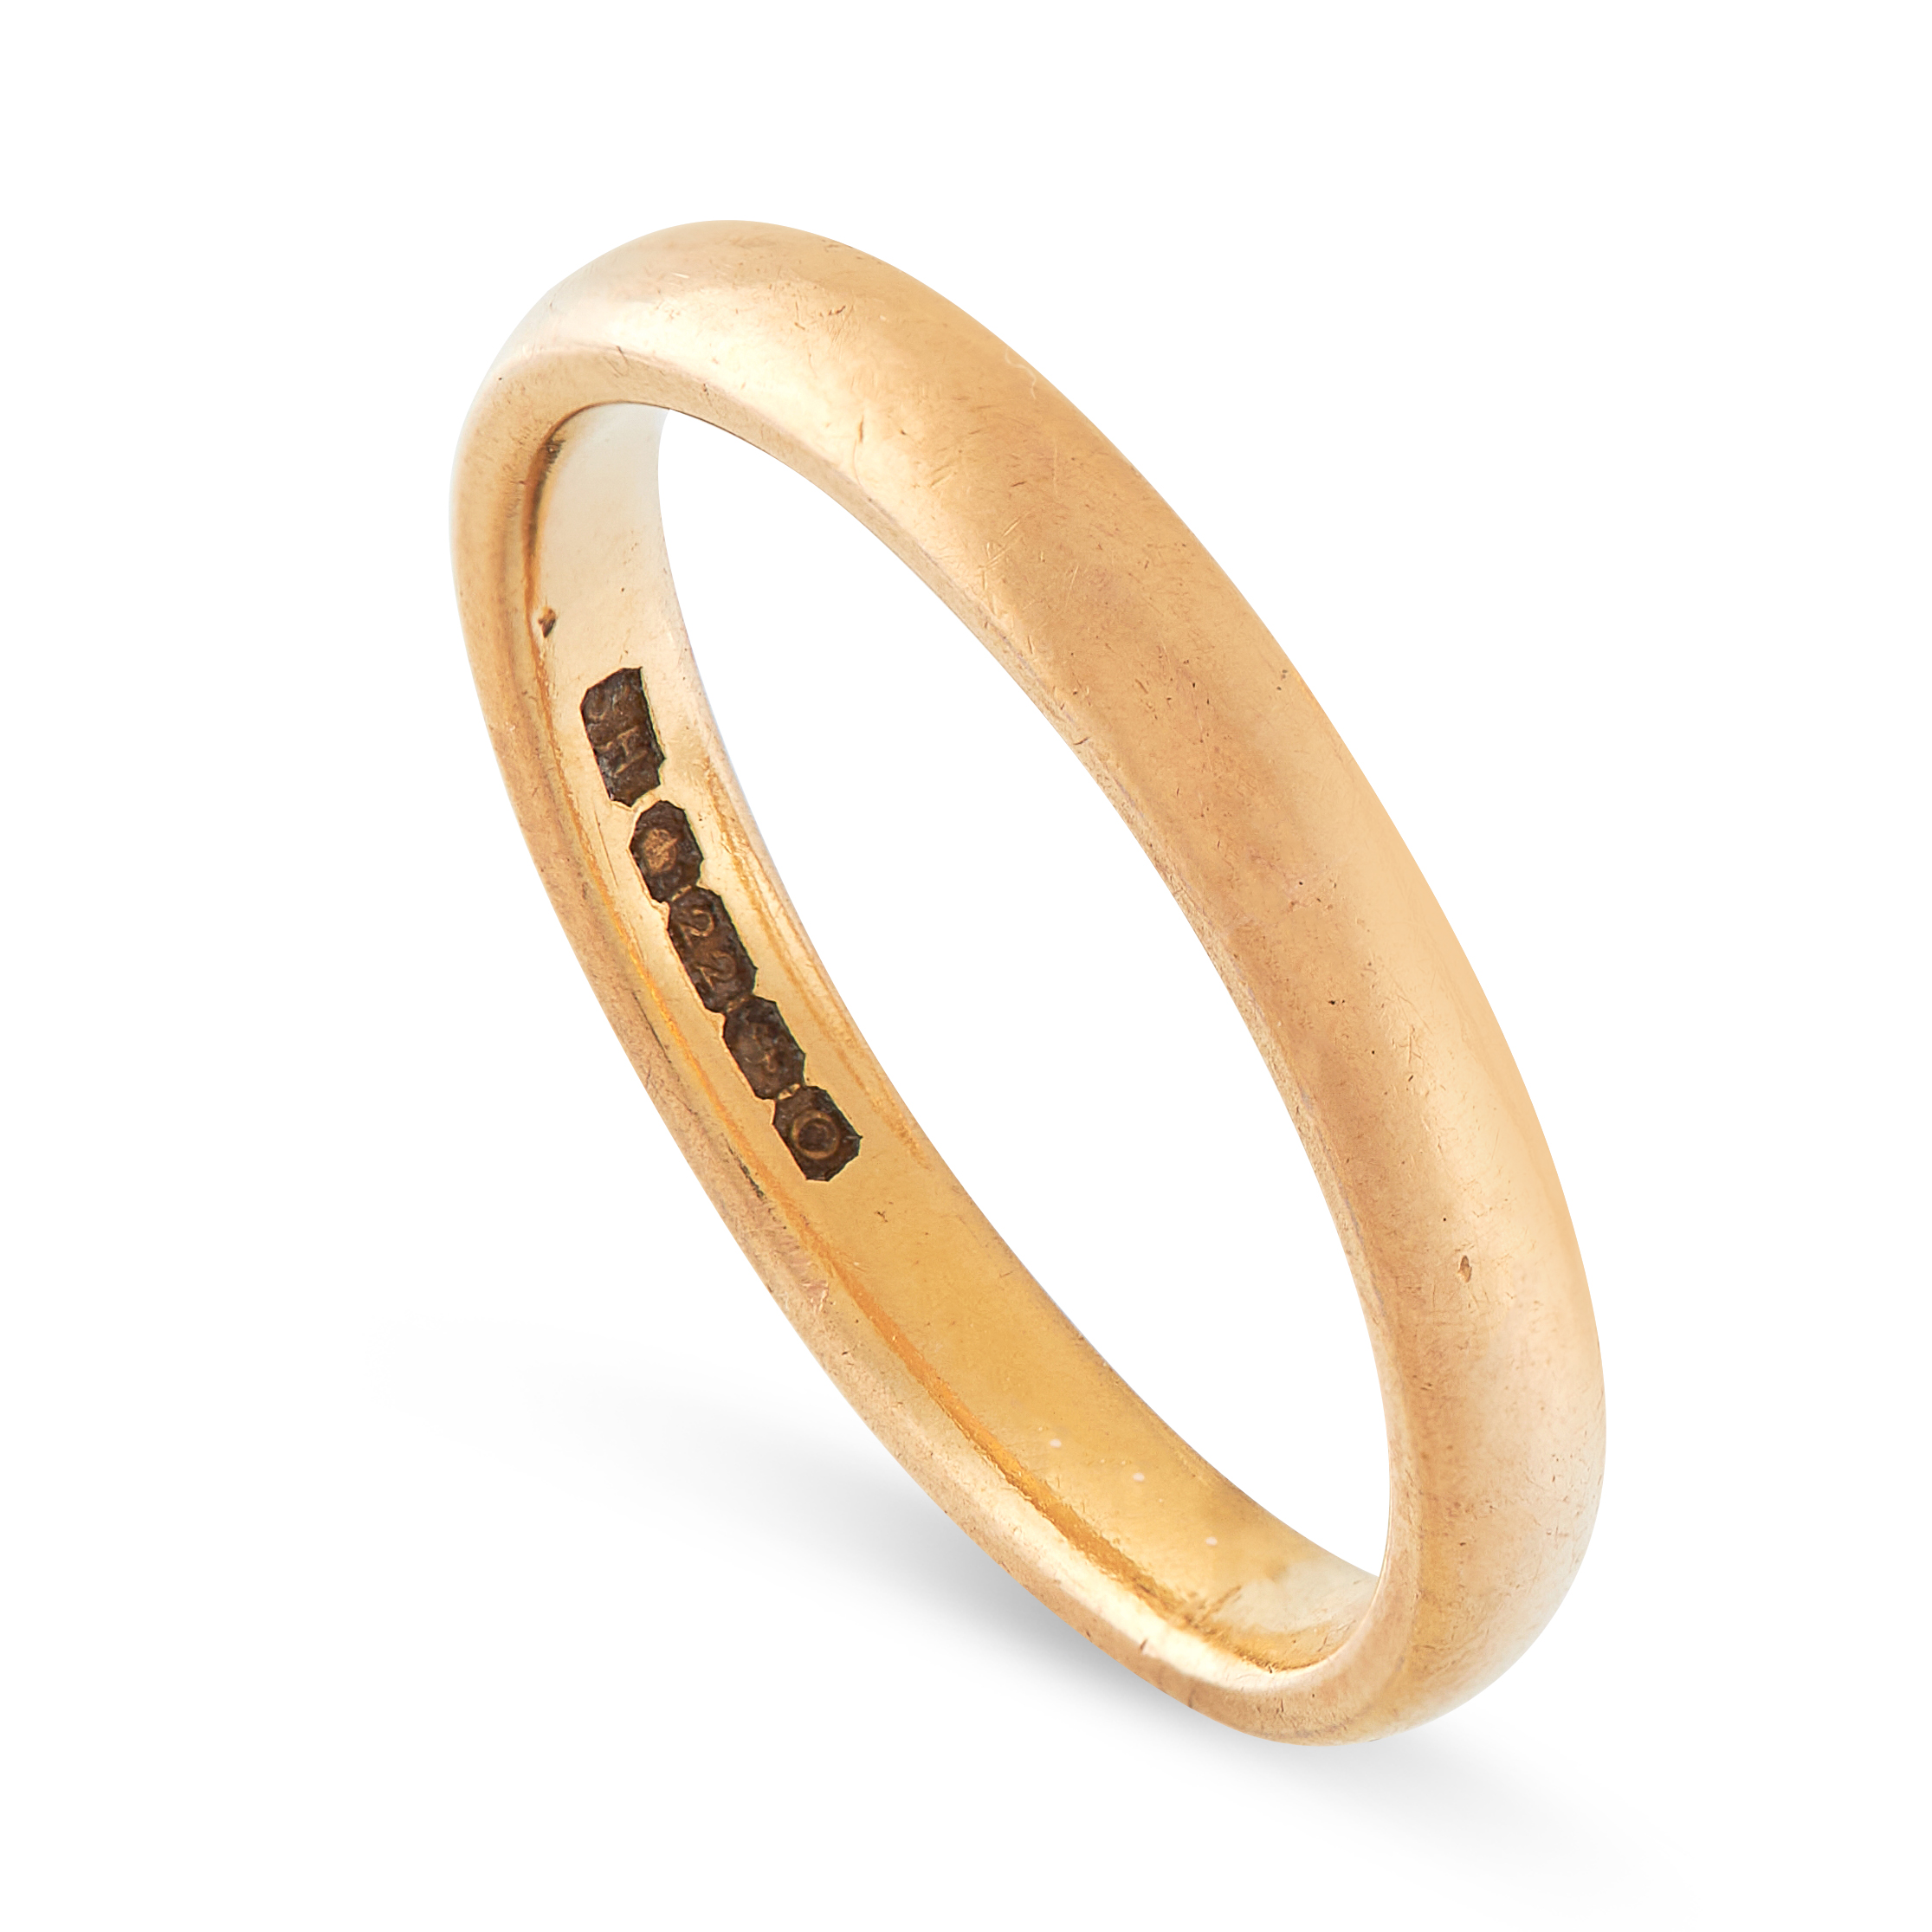 THREE WEDDING BAND RINGS in 22ct yellow gold, British hallmarks, sizes M / 6, R / 8.5, O / 7, - Image 4 of 6